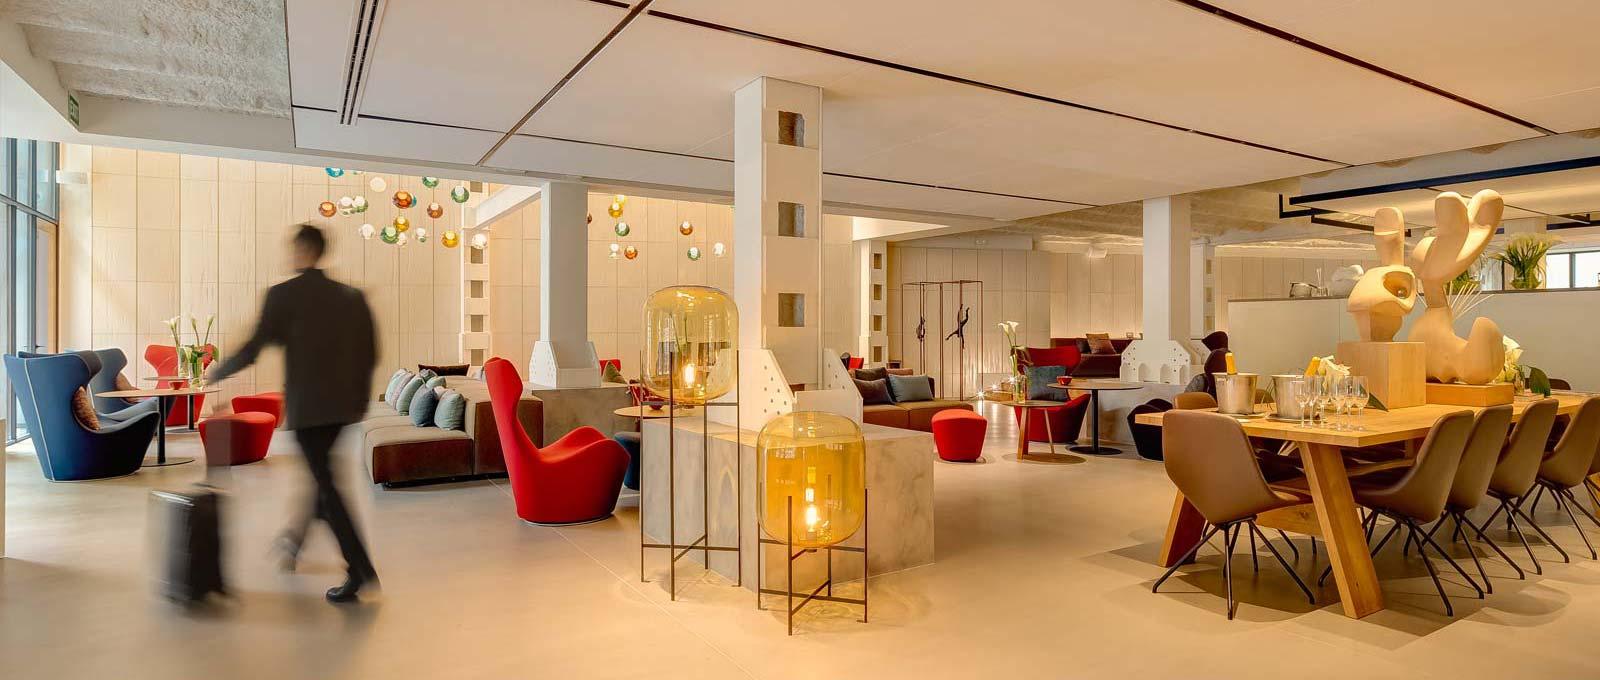 ohla-eixample-hotel-barcelona